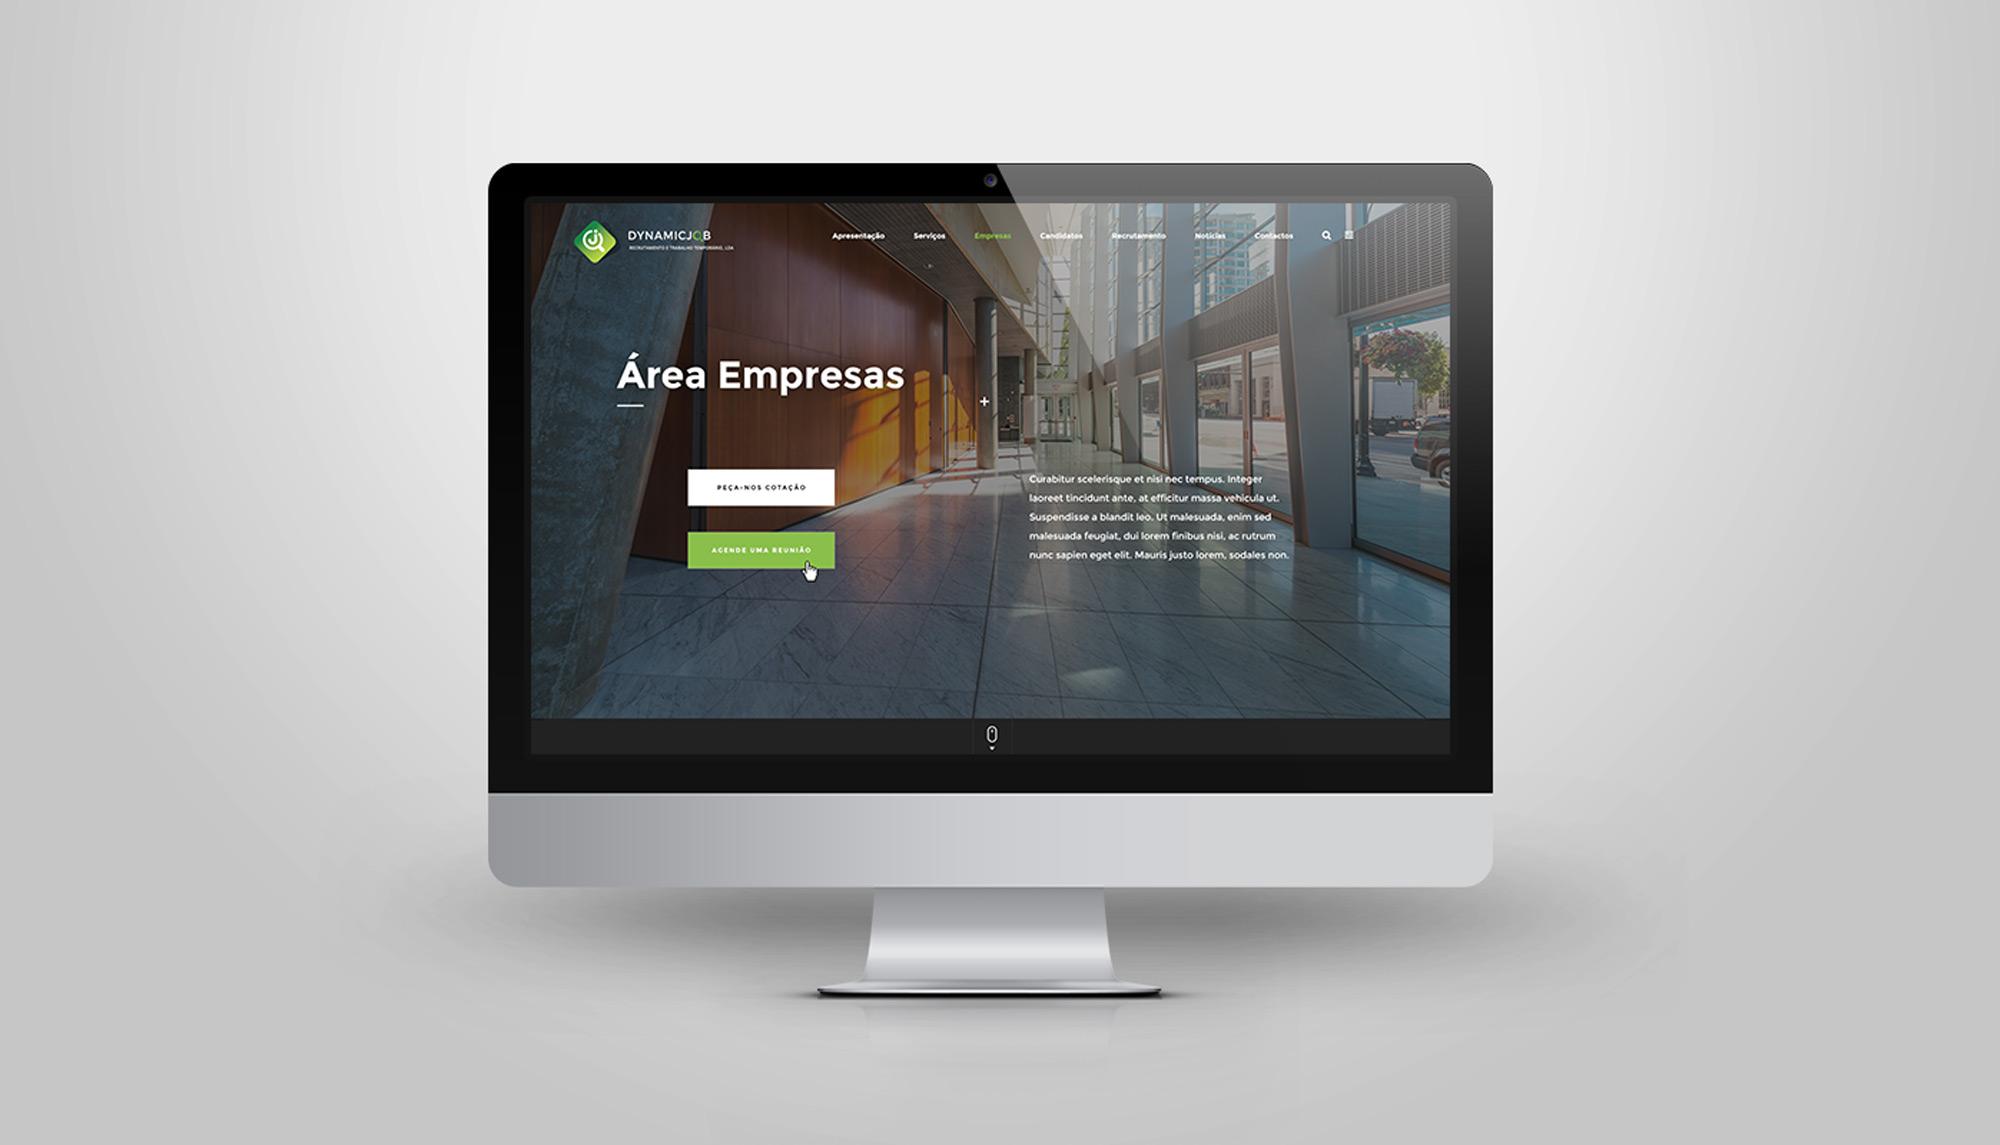 dynamicjob-website